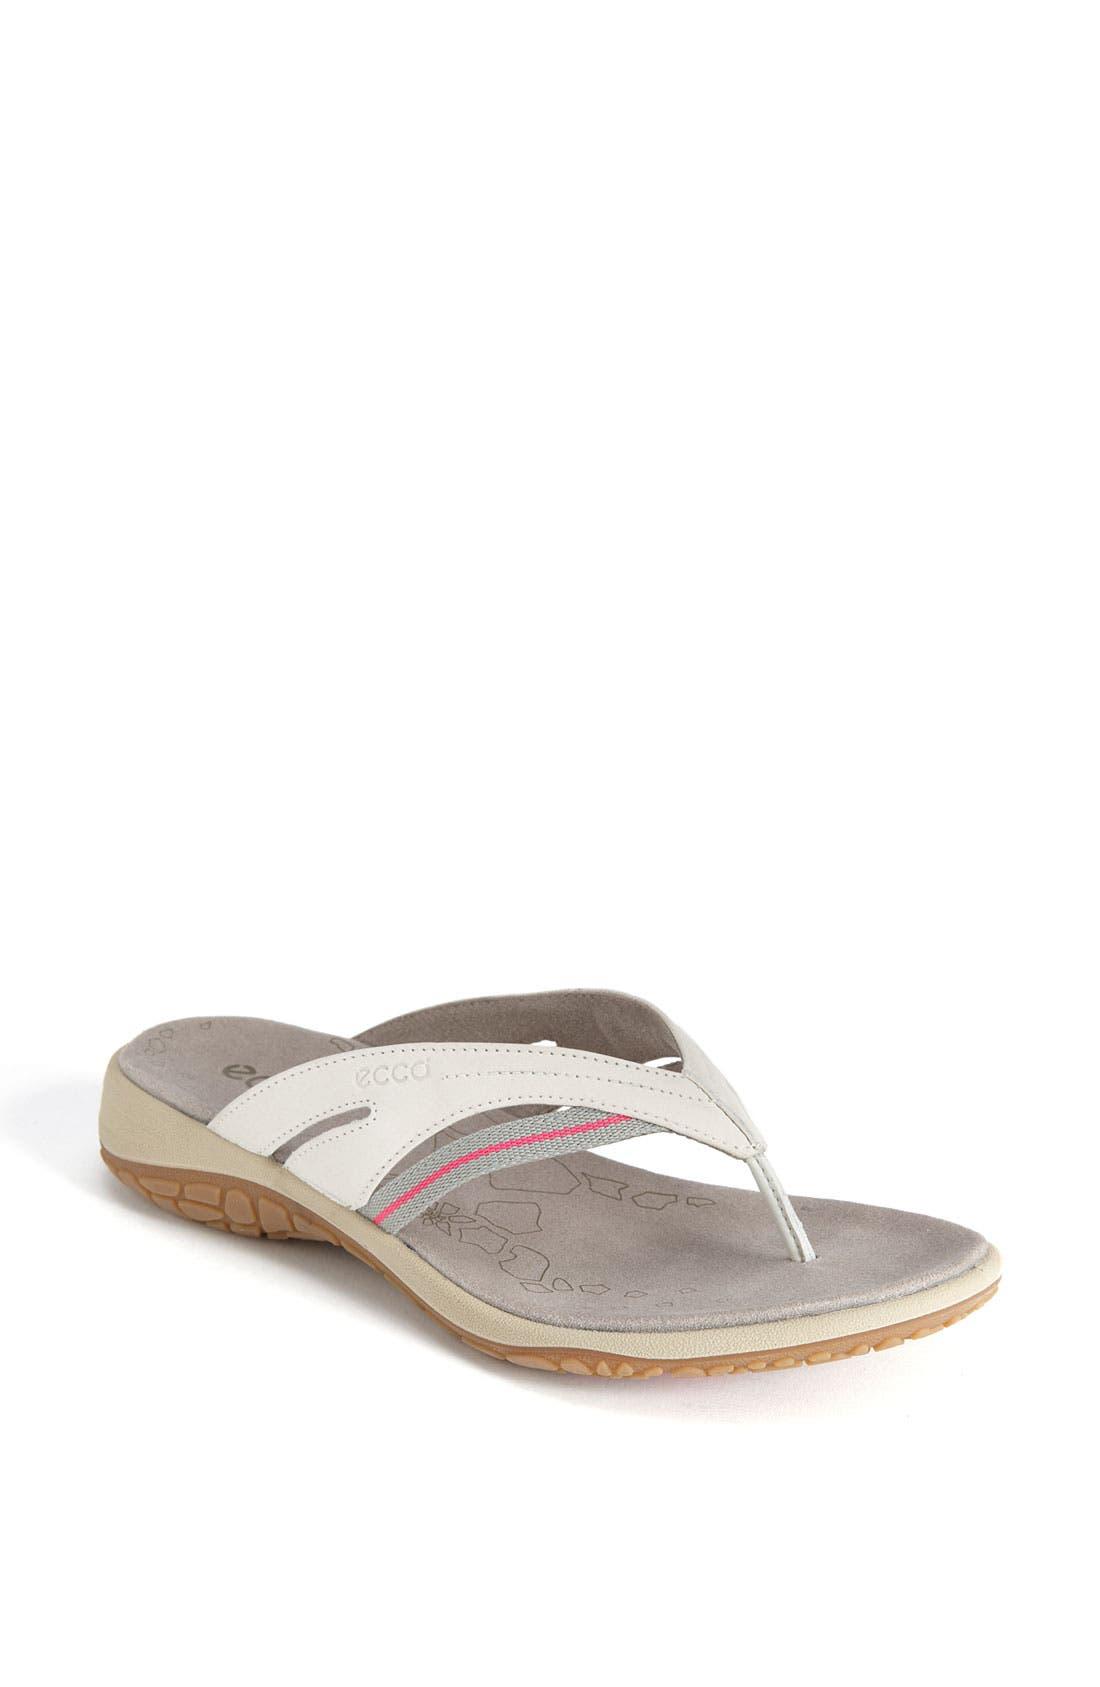 Alternate Image 1 Selected - ECCO 'Kawaii' Sandal